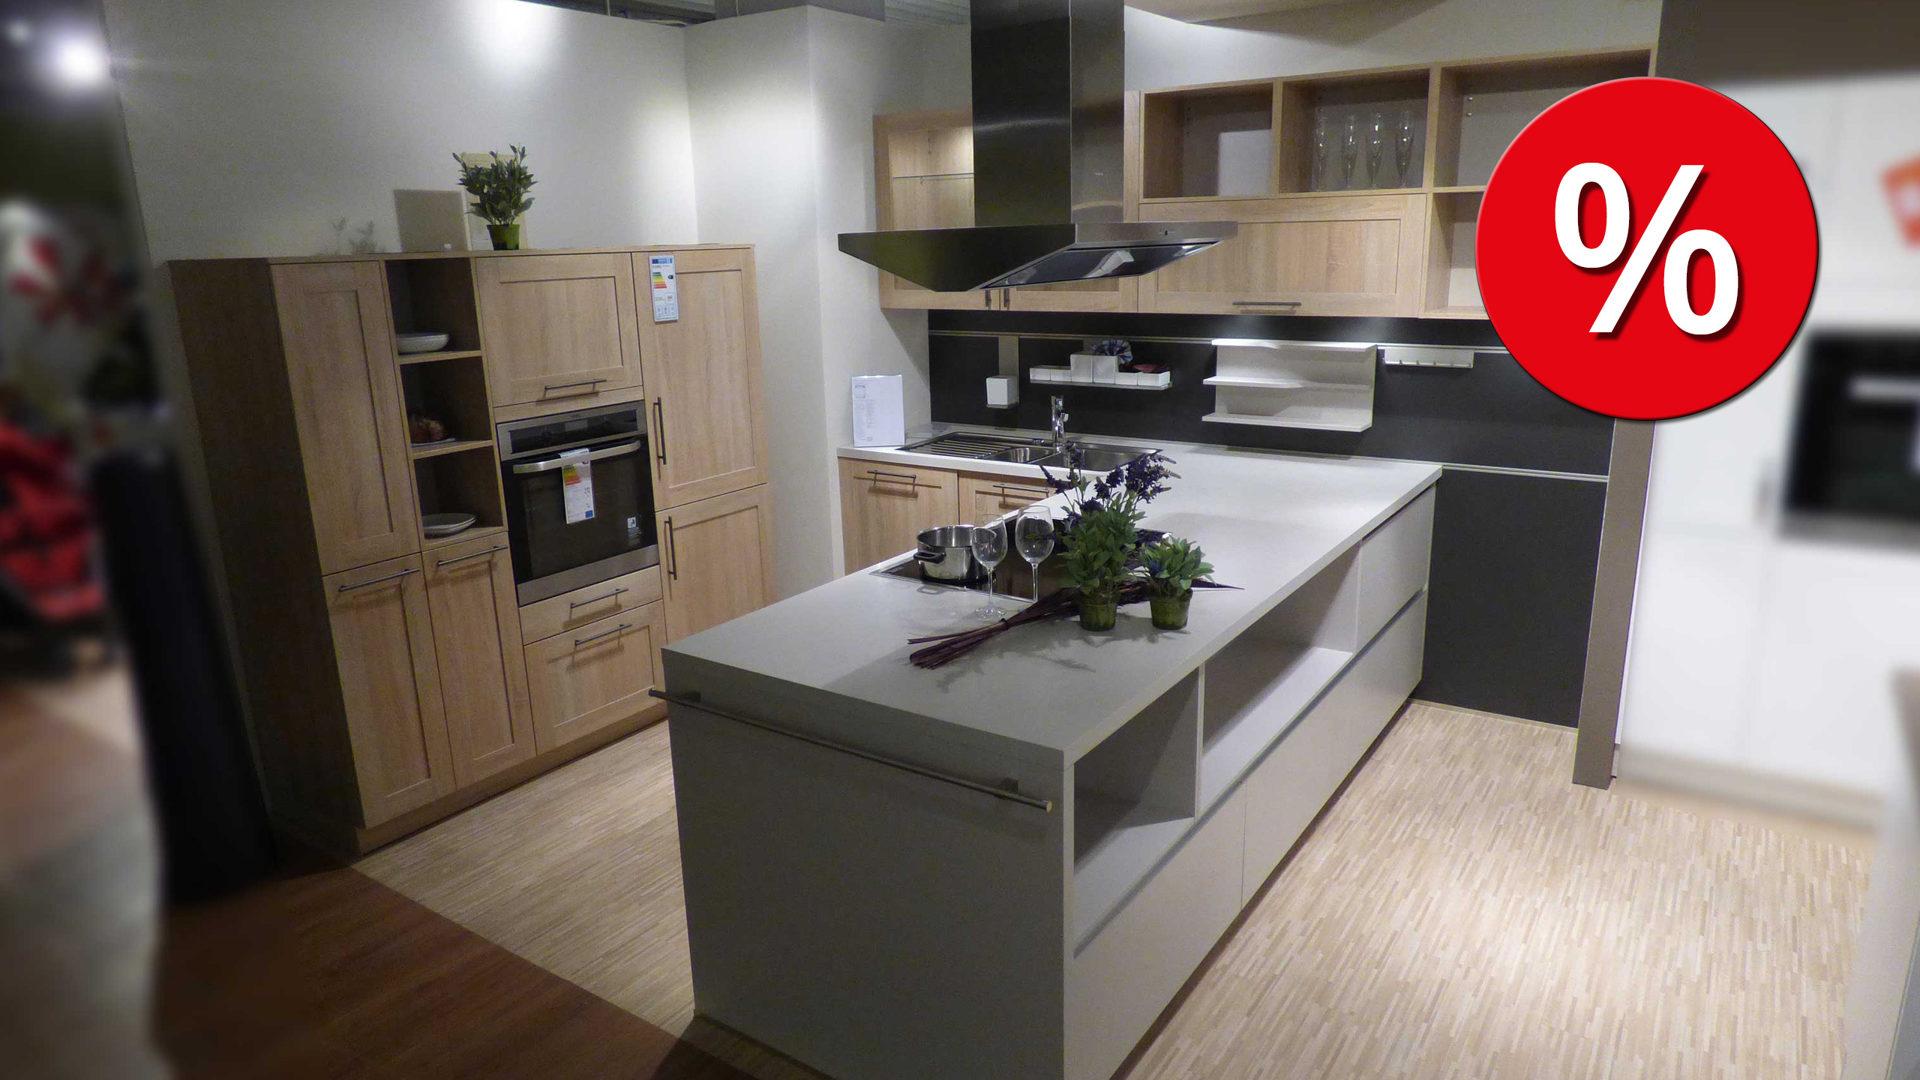 Küche inkl elektrogeräte günstig  Möbelland Hochtaunus Bad Homburg bei Frankfurt | Räume | Küche ...